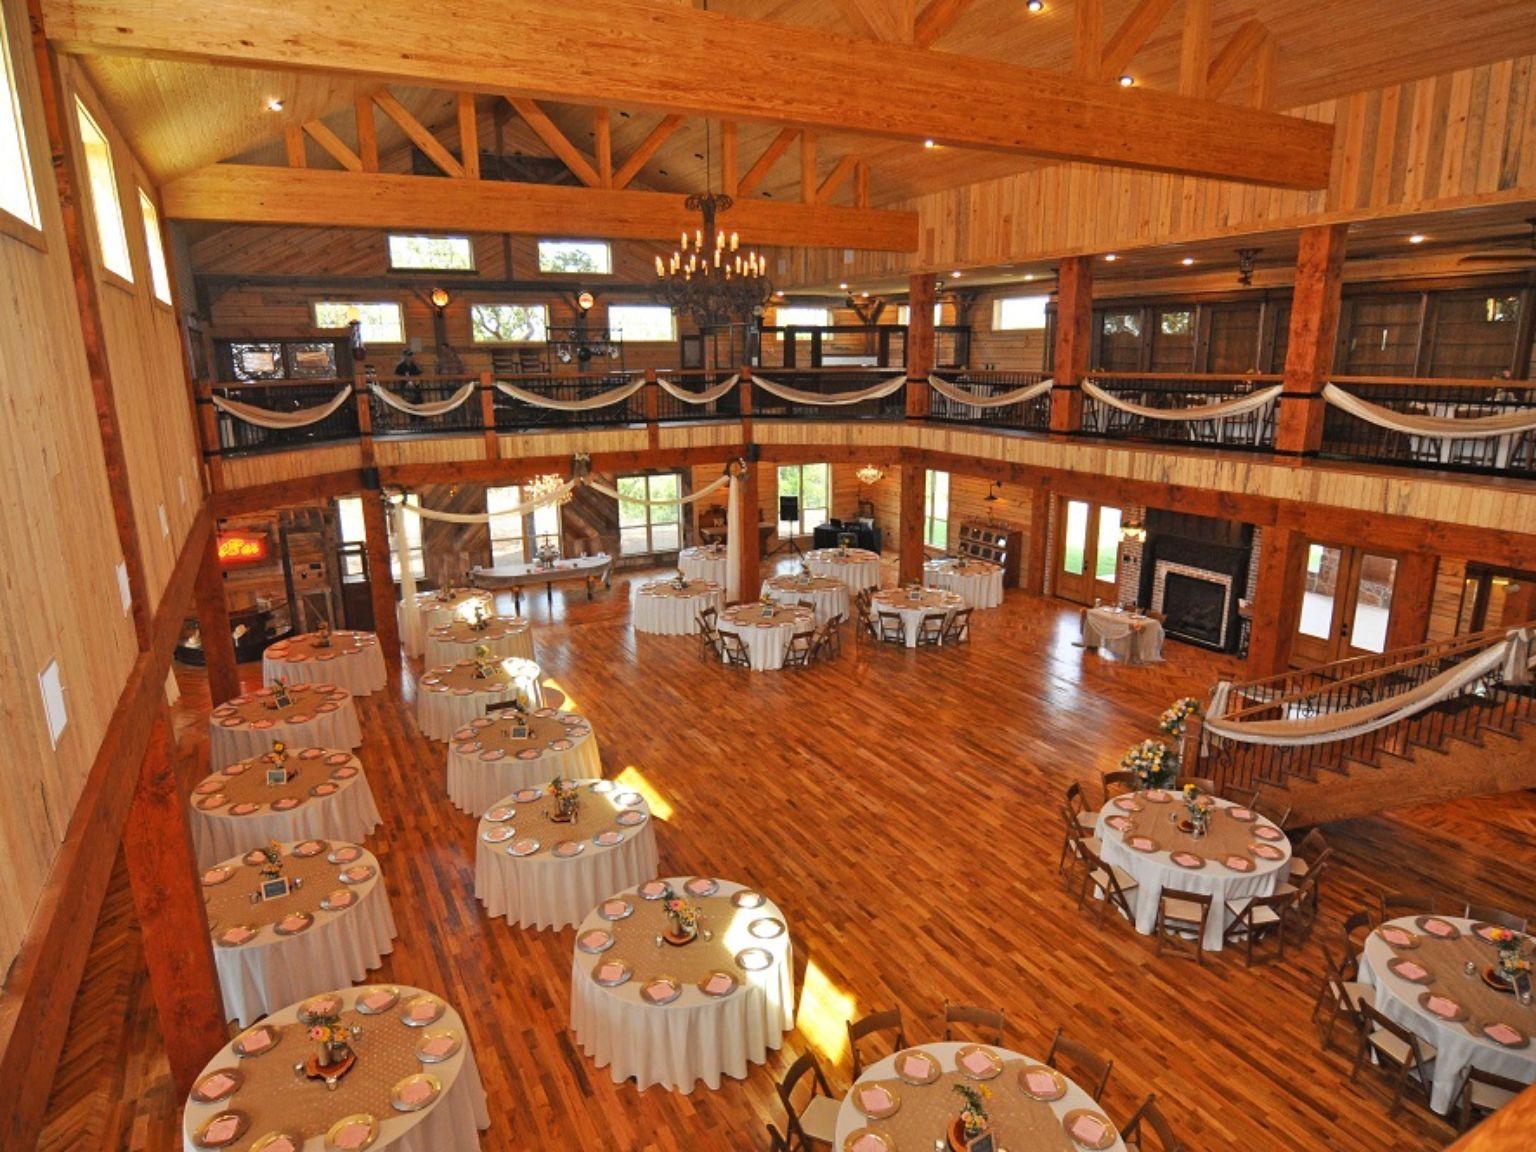 Oak Knoll Ranch Springtown, Ranch wedding venue, Wedding